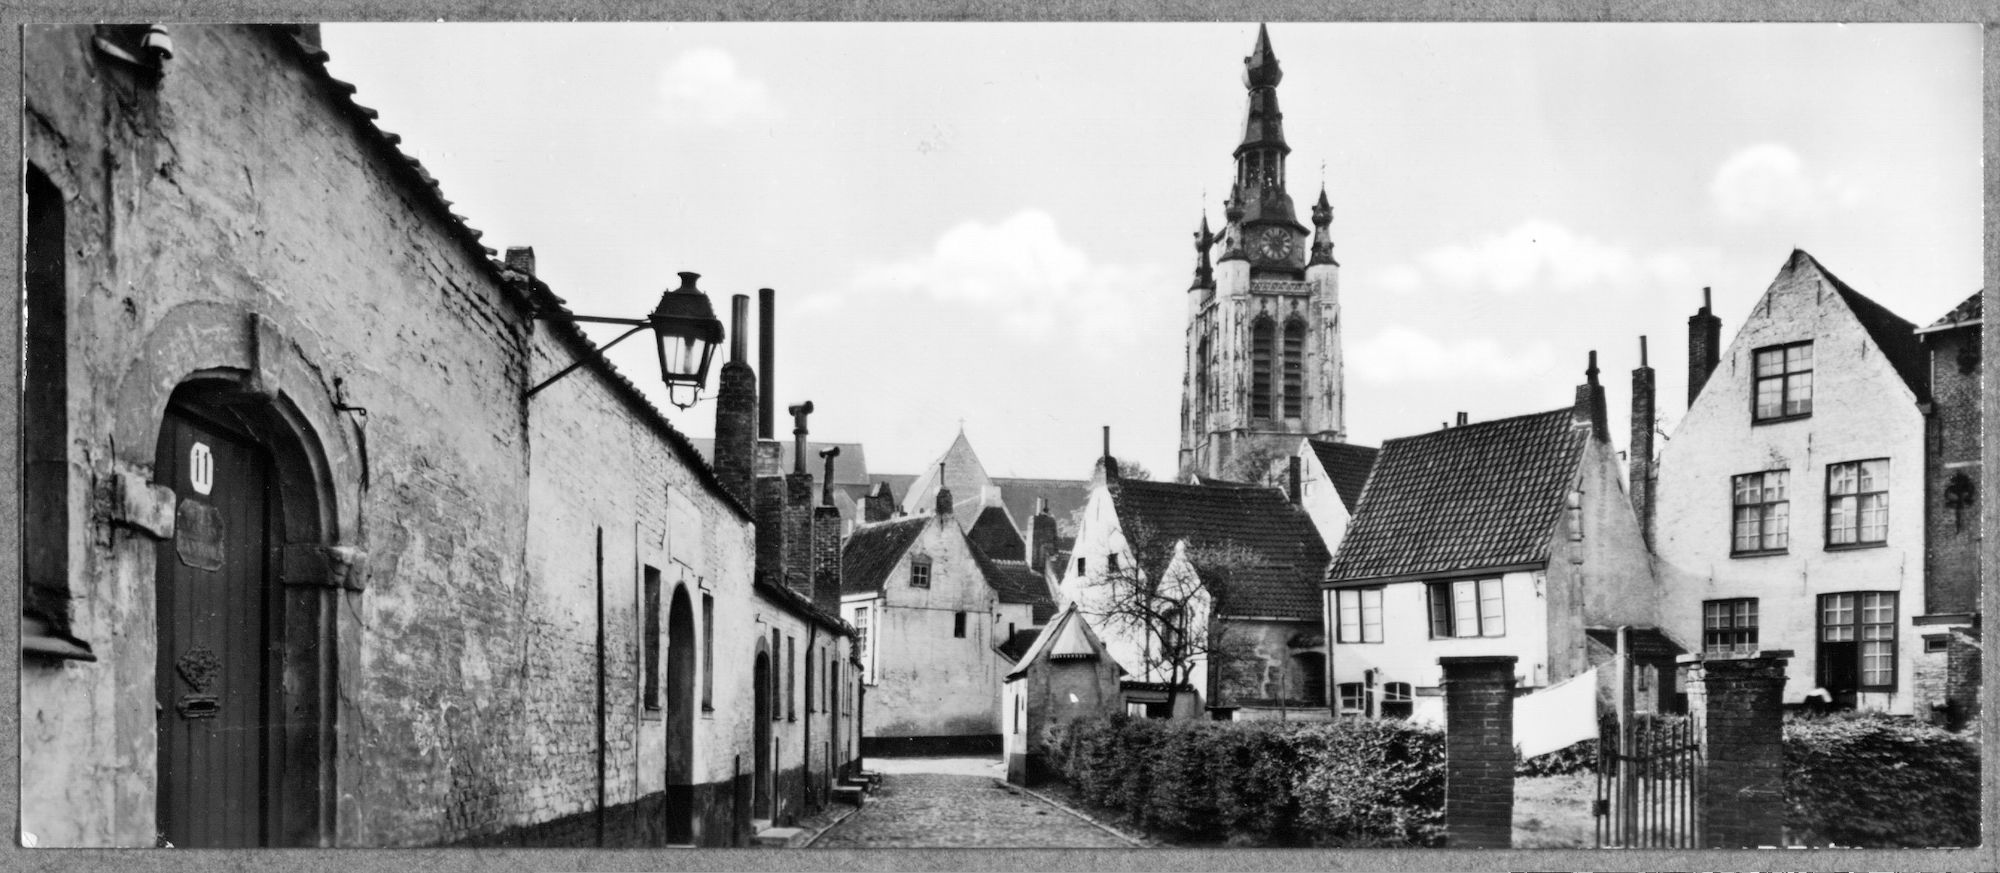 Sint-Elisabeth Begijnhof